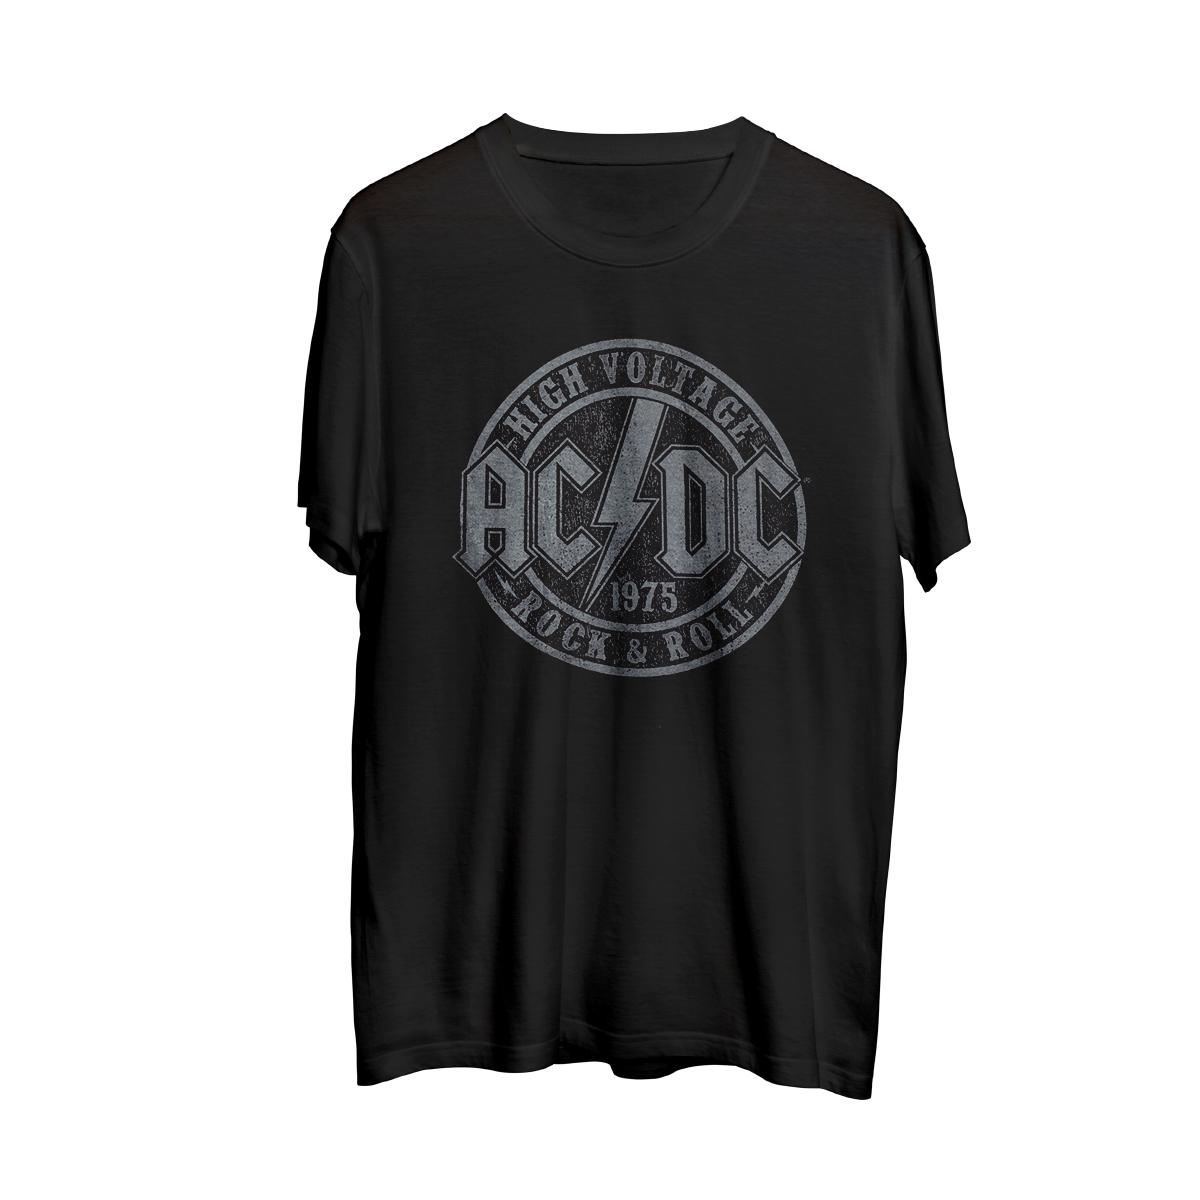 AC/DC High Voltage Rock and Roll Circle Logo Black T-Shirt